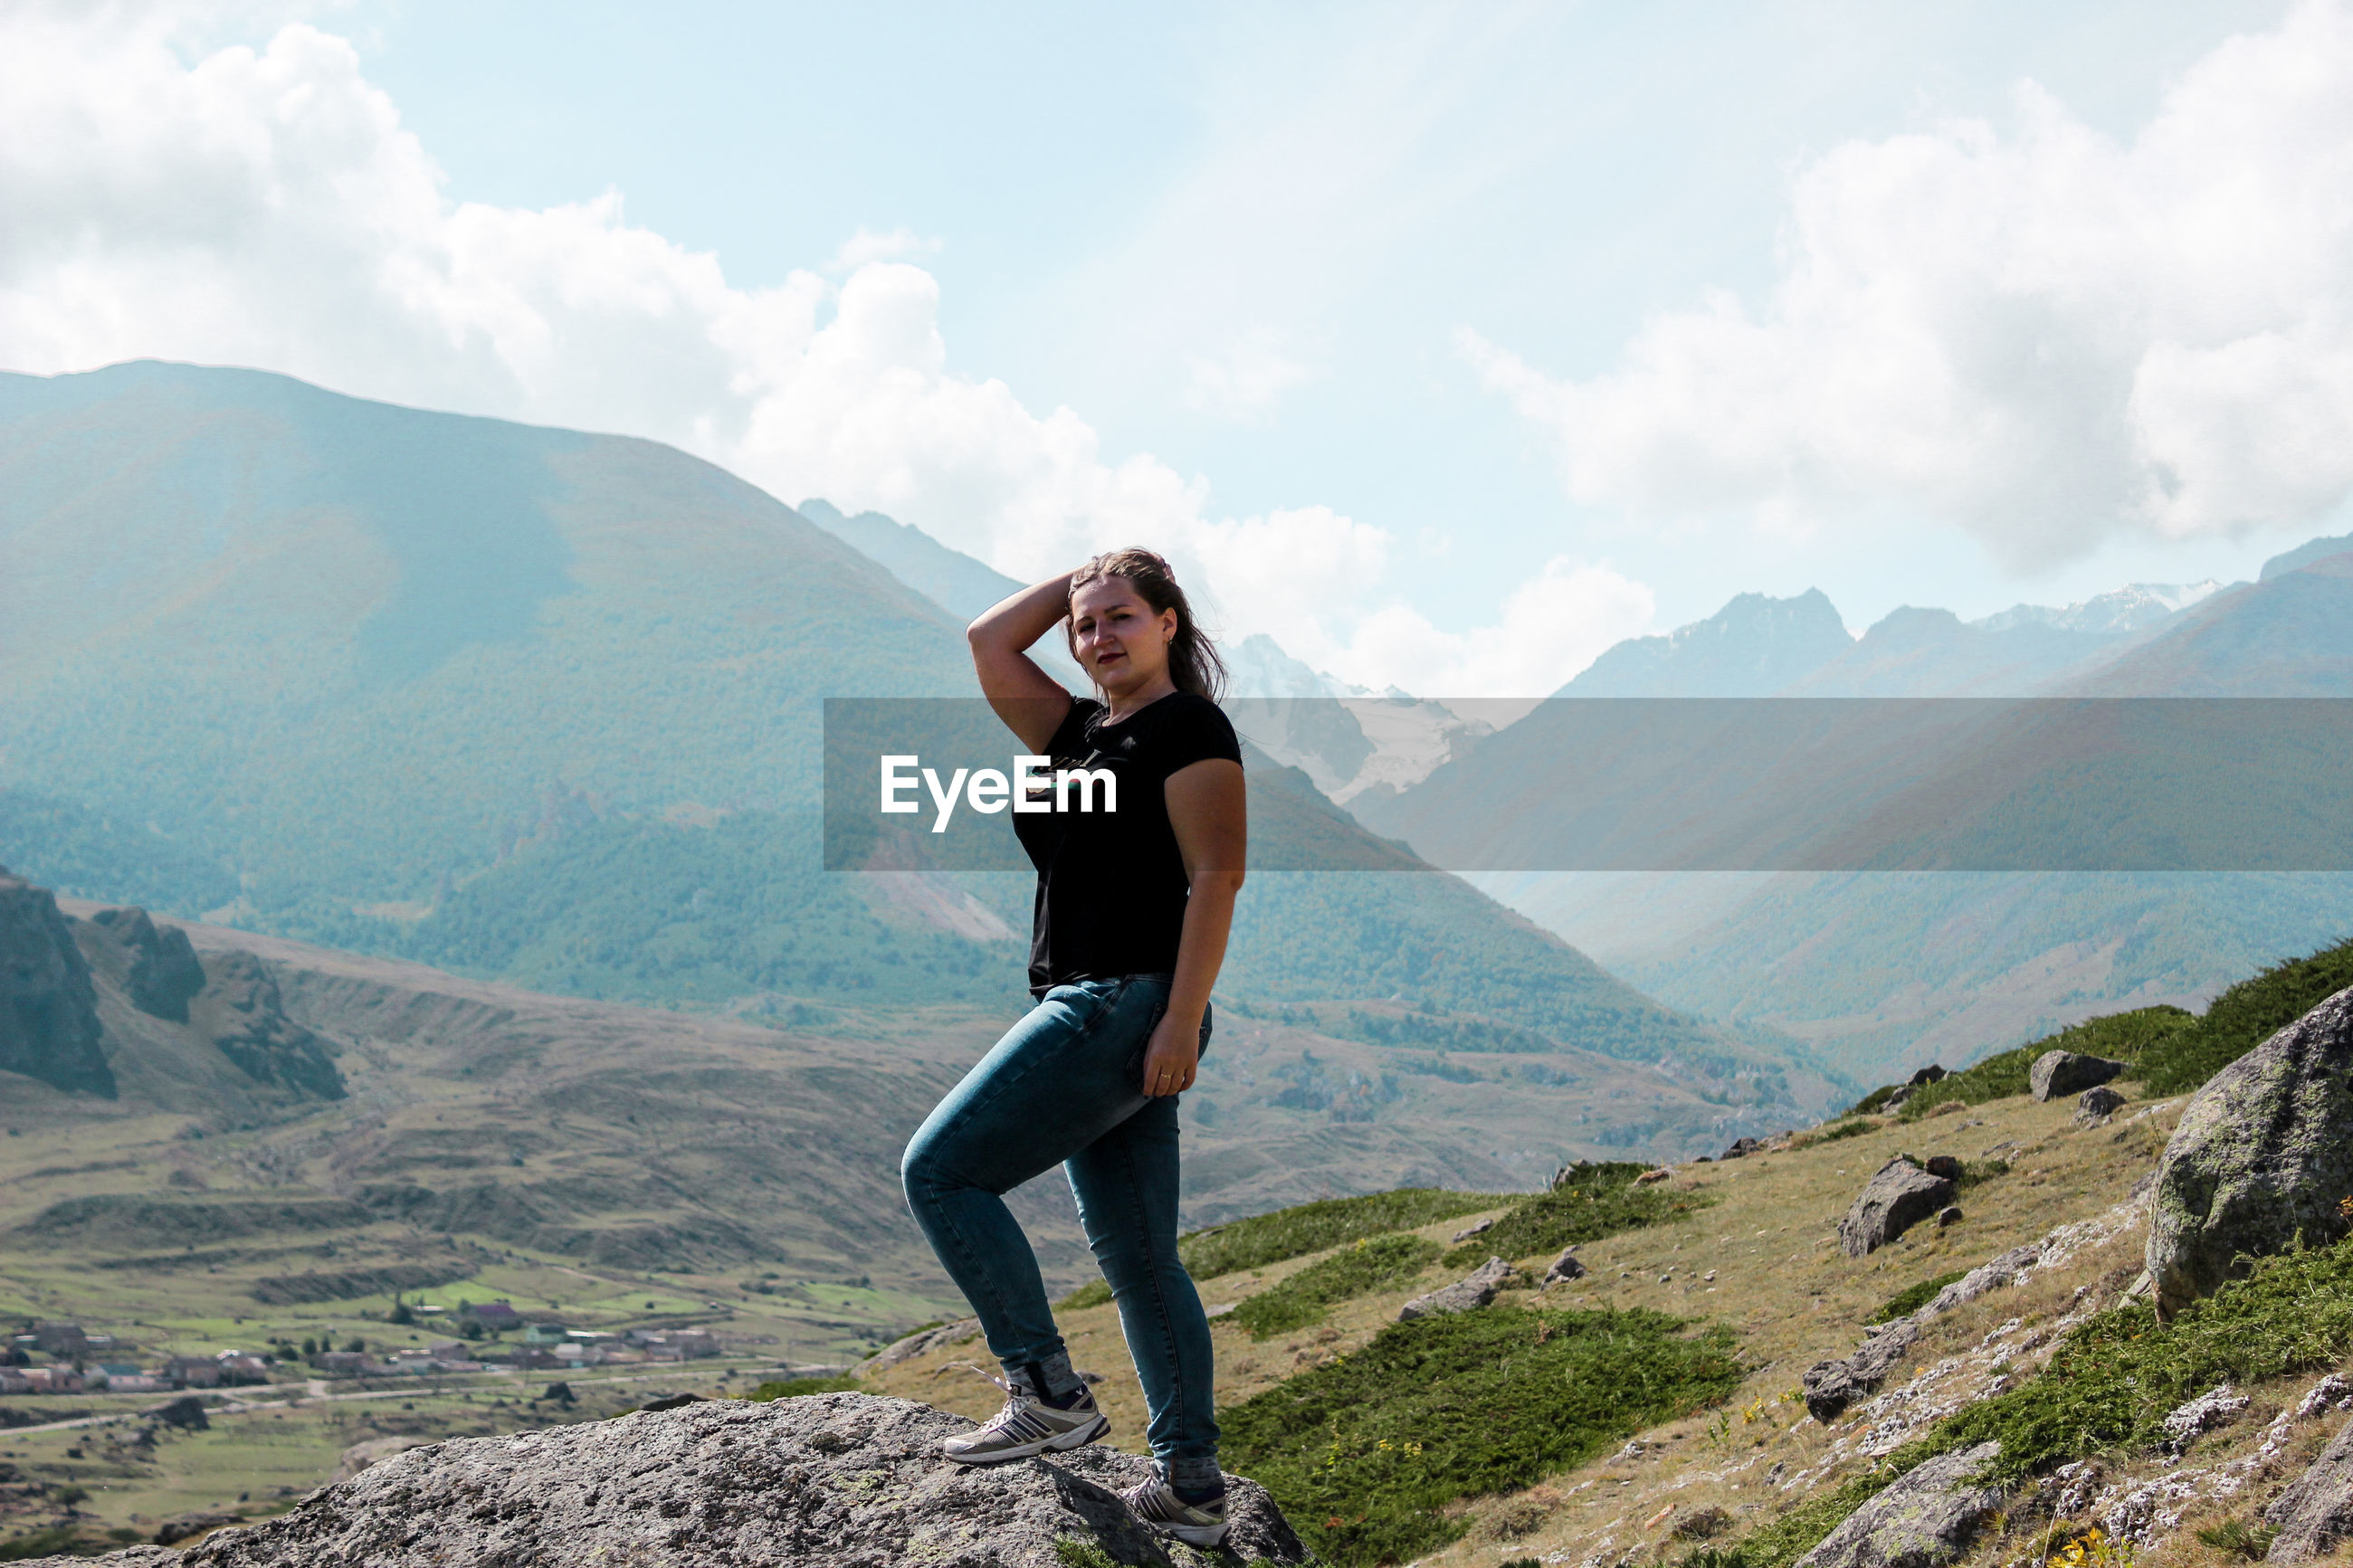 Portrait of woman standing on rock against mountain range